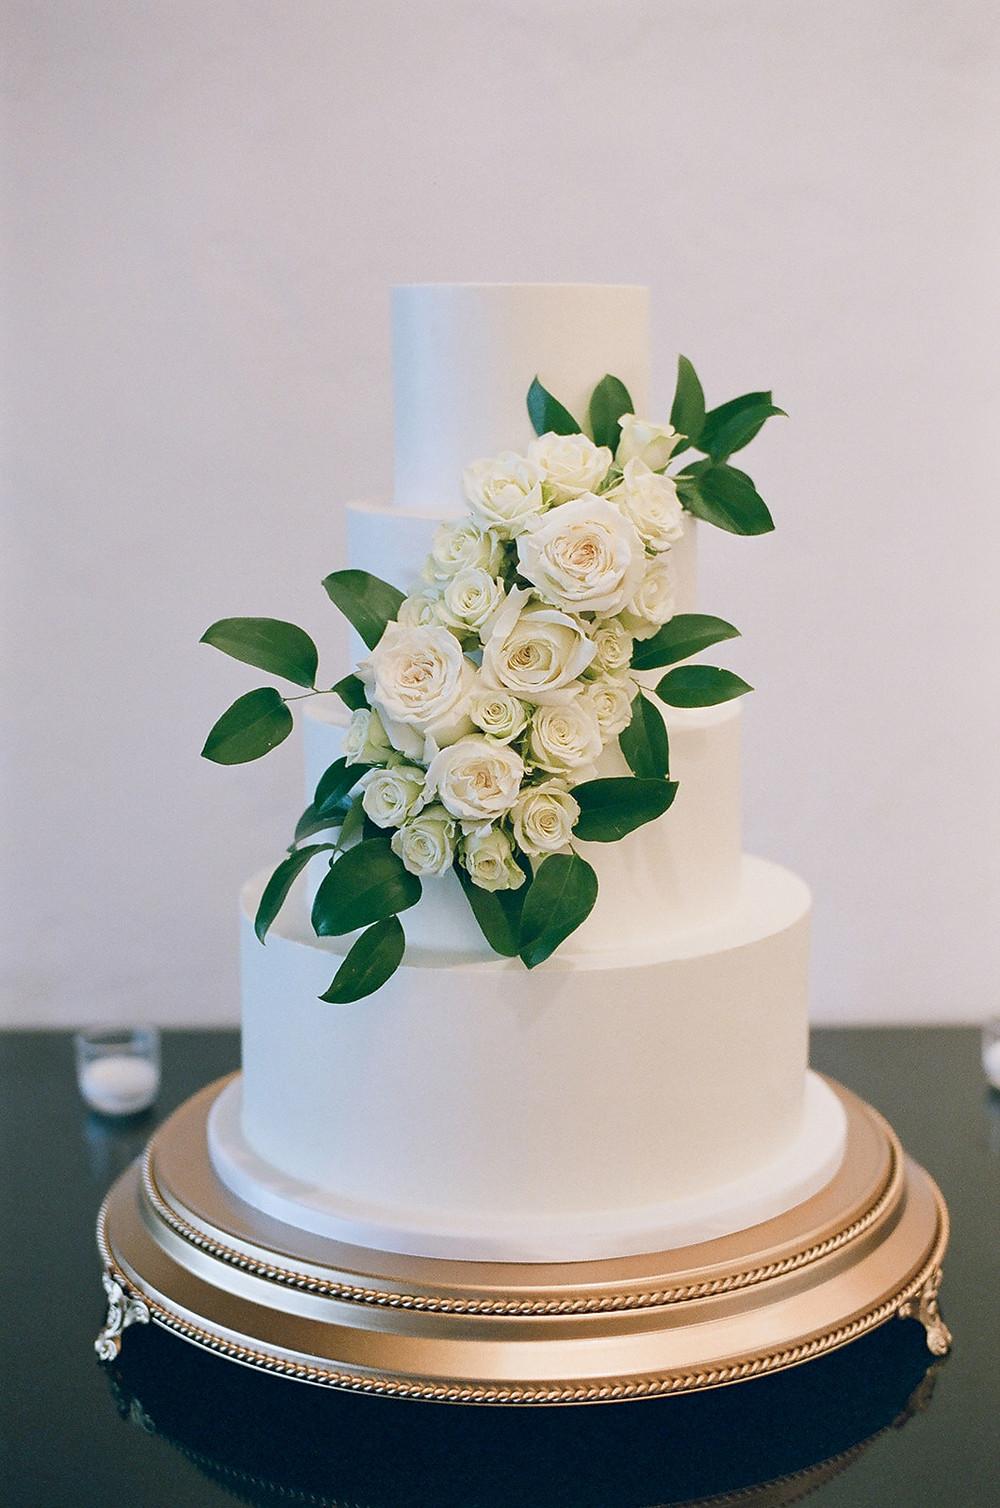 Colorado Mountain Wedding. Classic white and green wedding. Vail Colorado Weddings. Katy Pierson Cake.